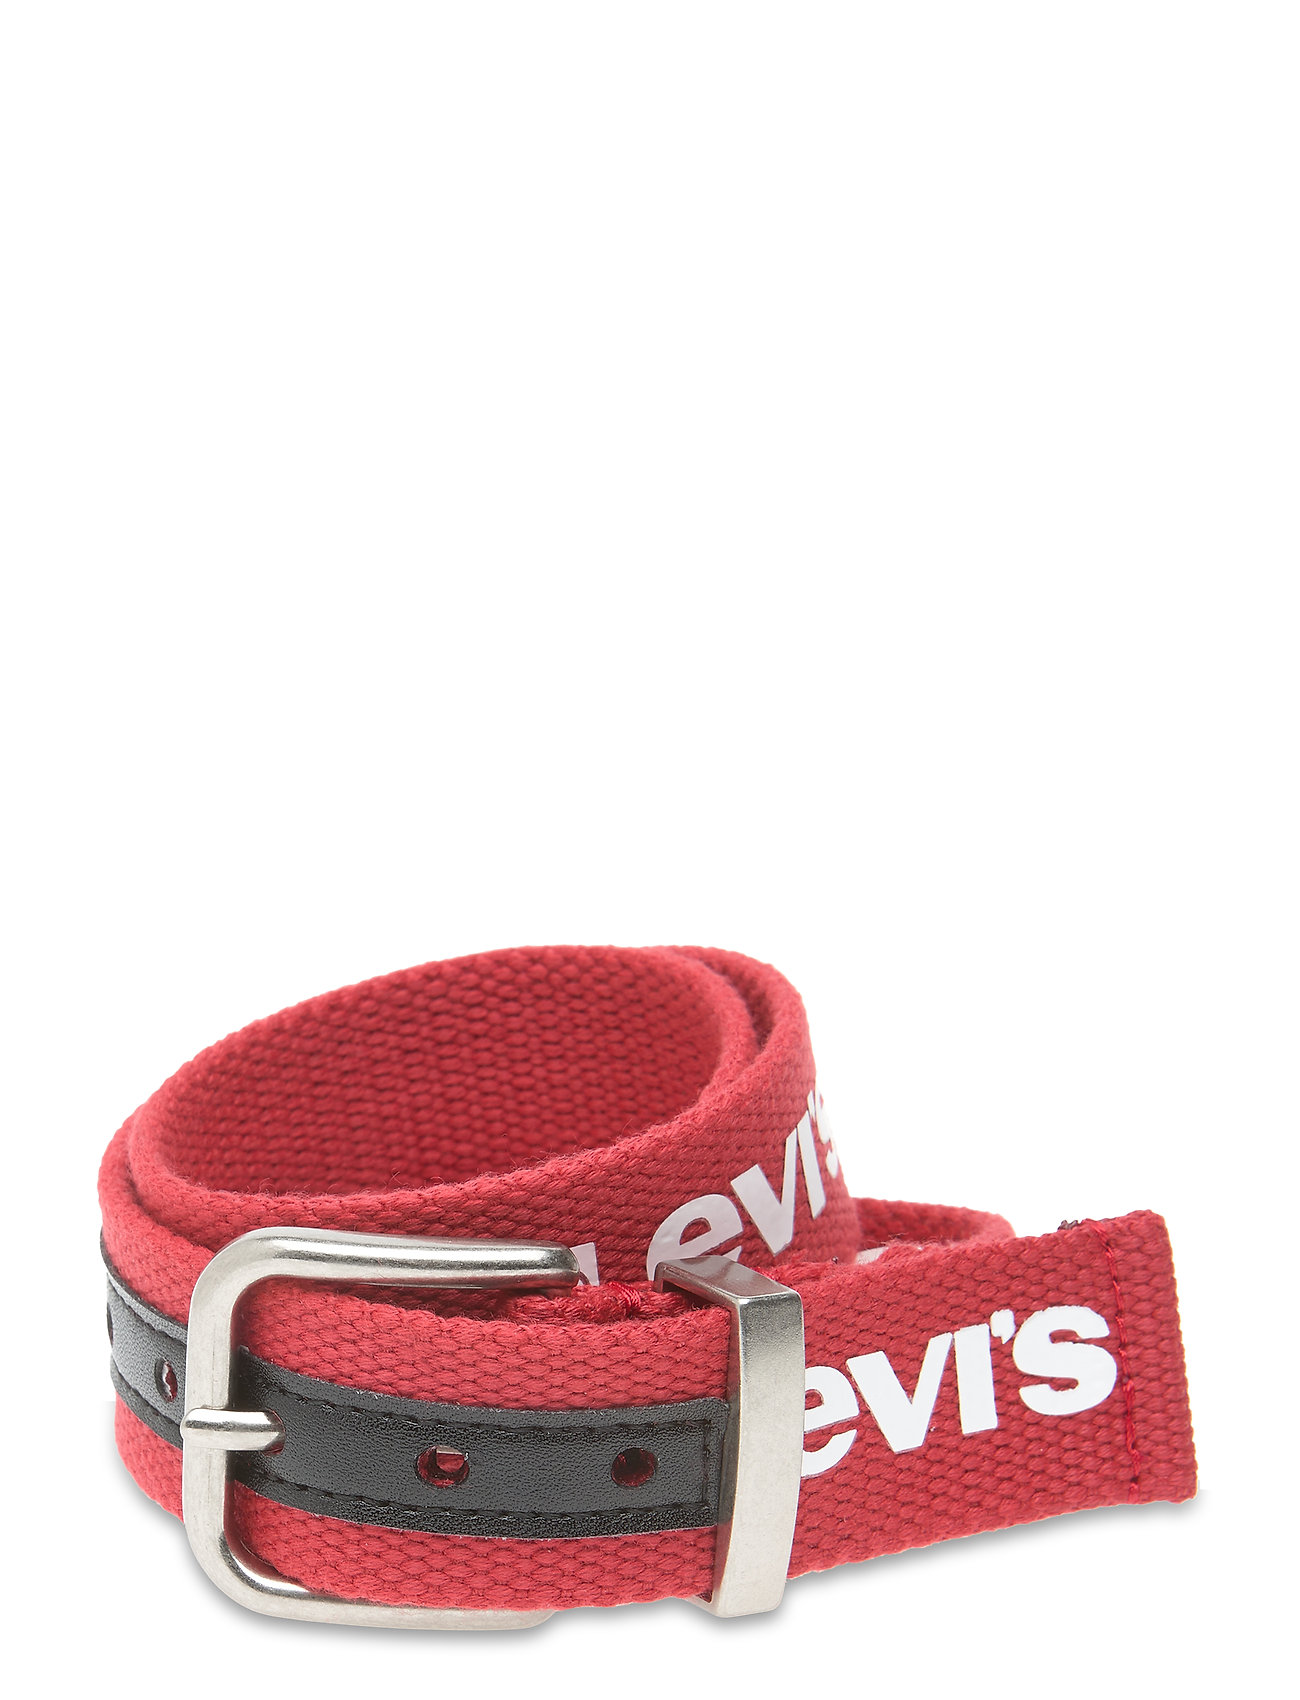 Levi's - LEVIS WEBBING BELT - chili pepper - 0